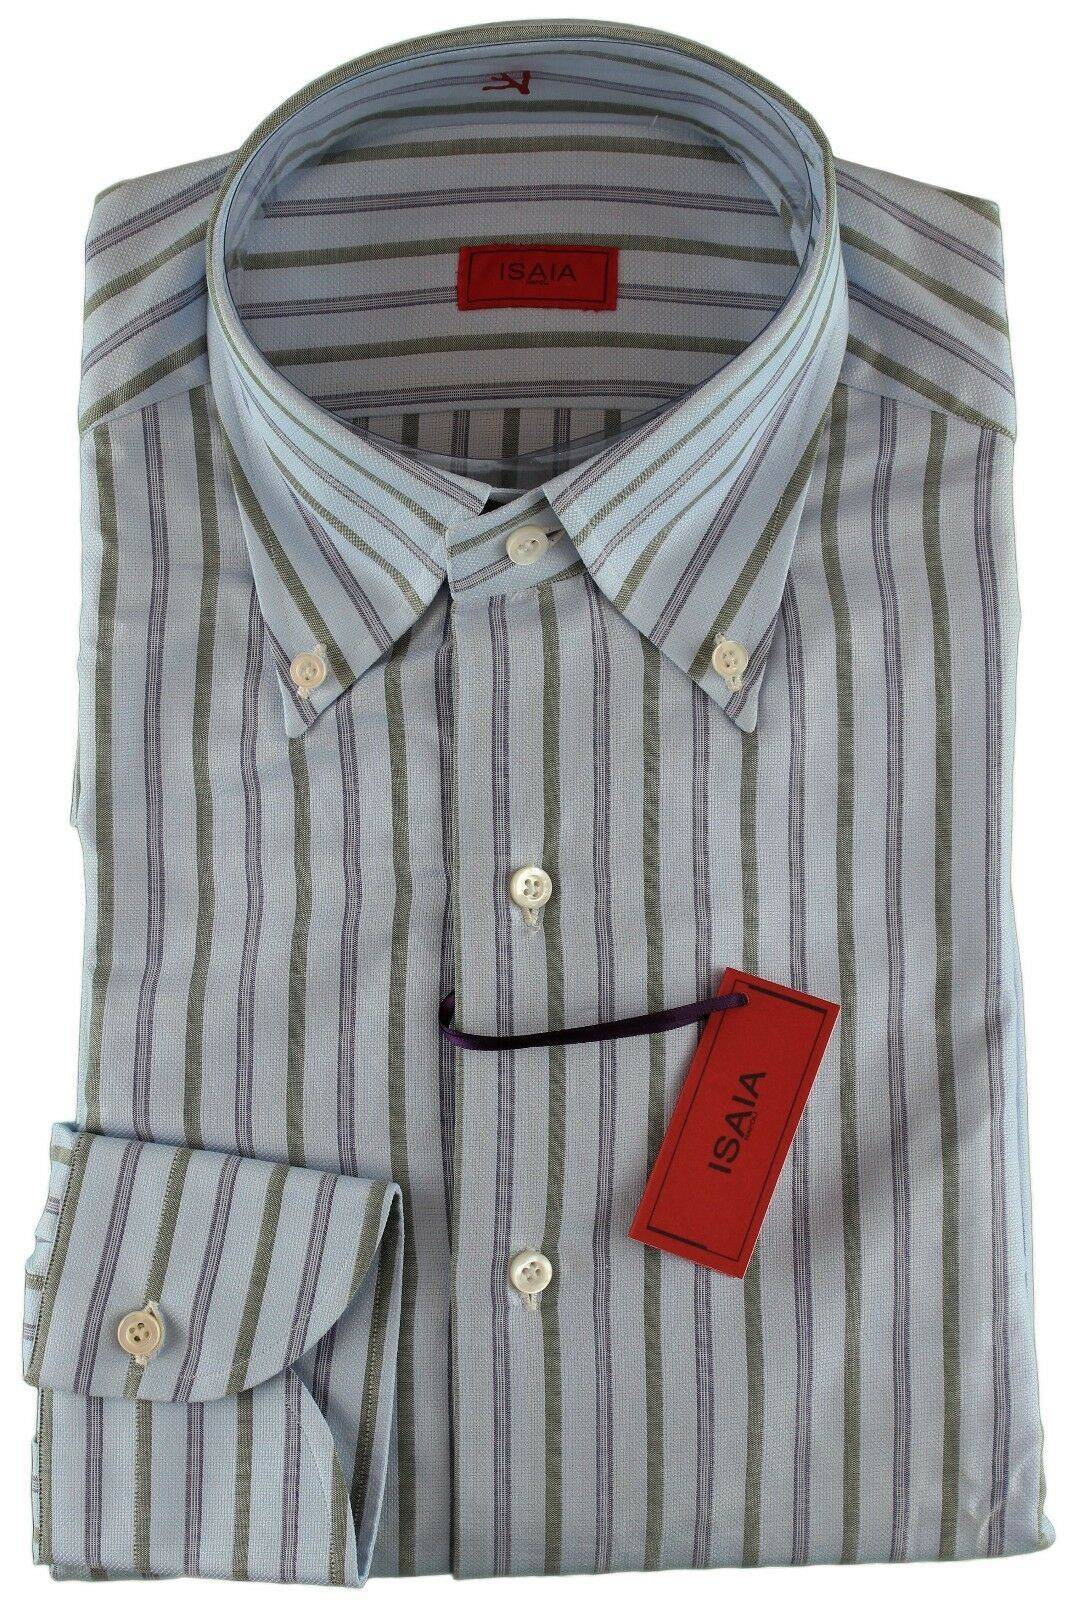 NWT ISAIA DRESS hemd sky Blau Grün striped luxury handmade  40 15 3 4